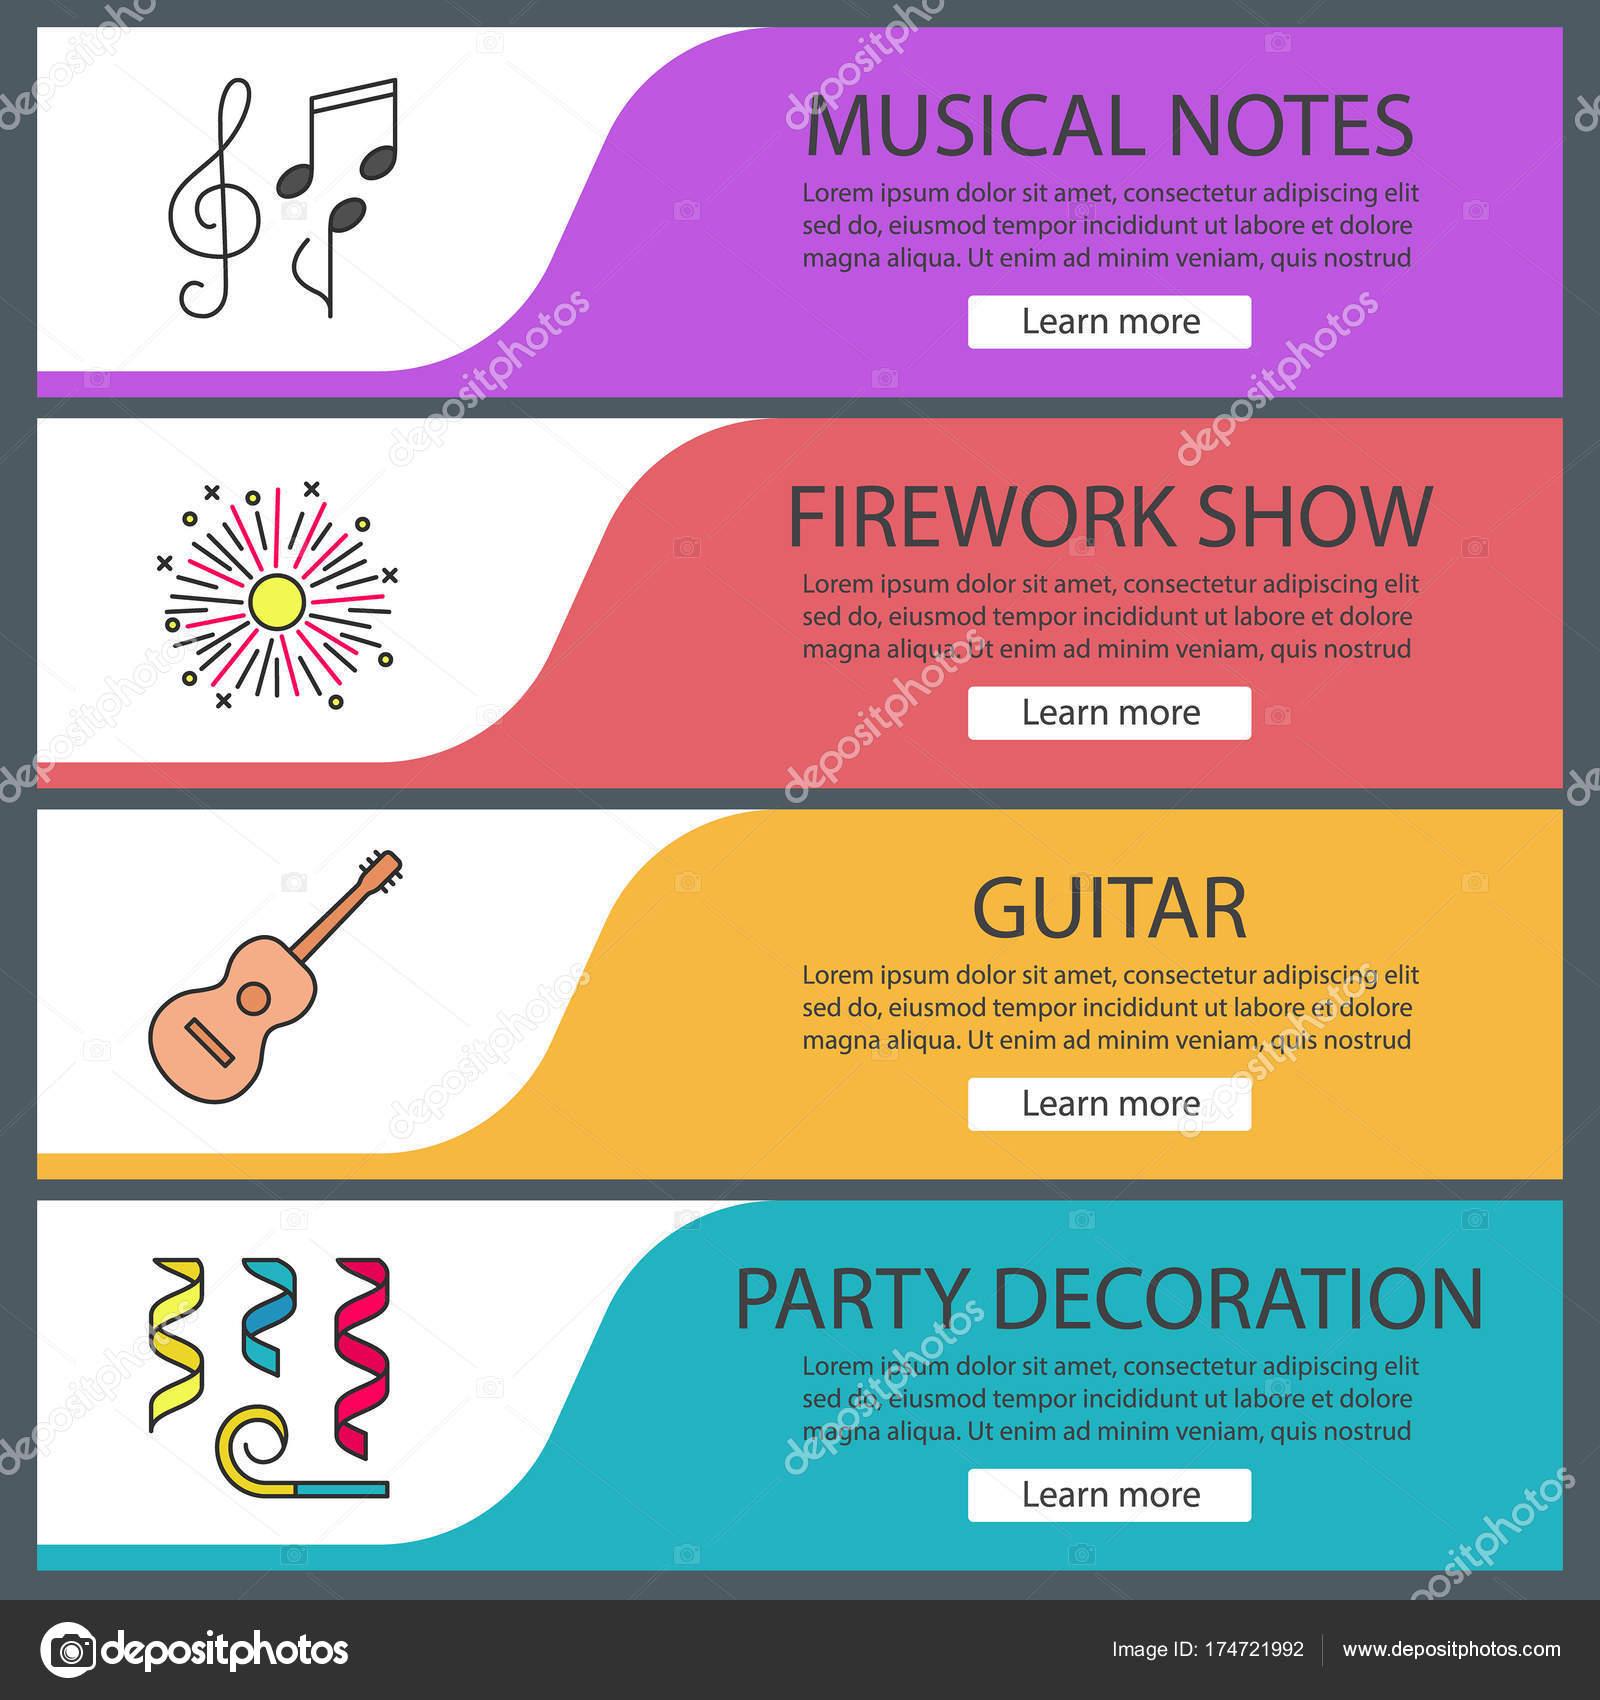 Accesorios fiestas banner plantillas — Vector de stock © bsd #174721992